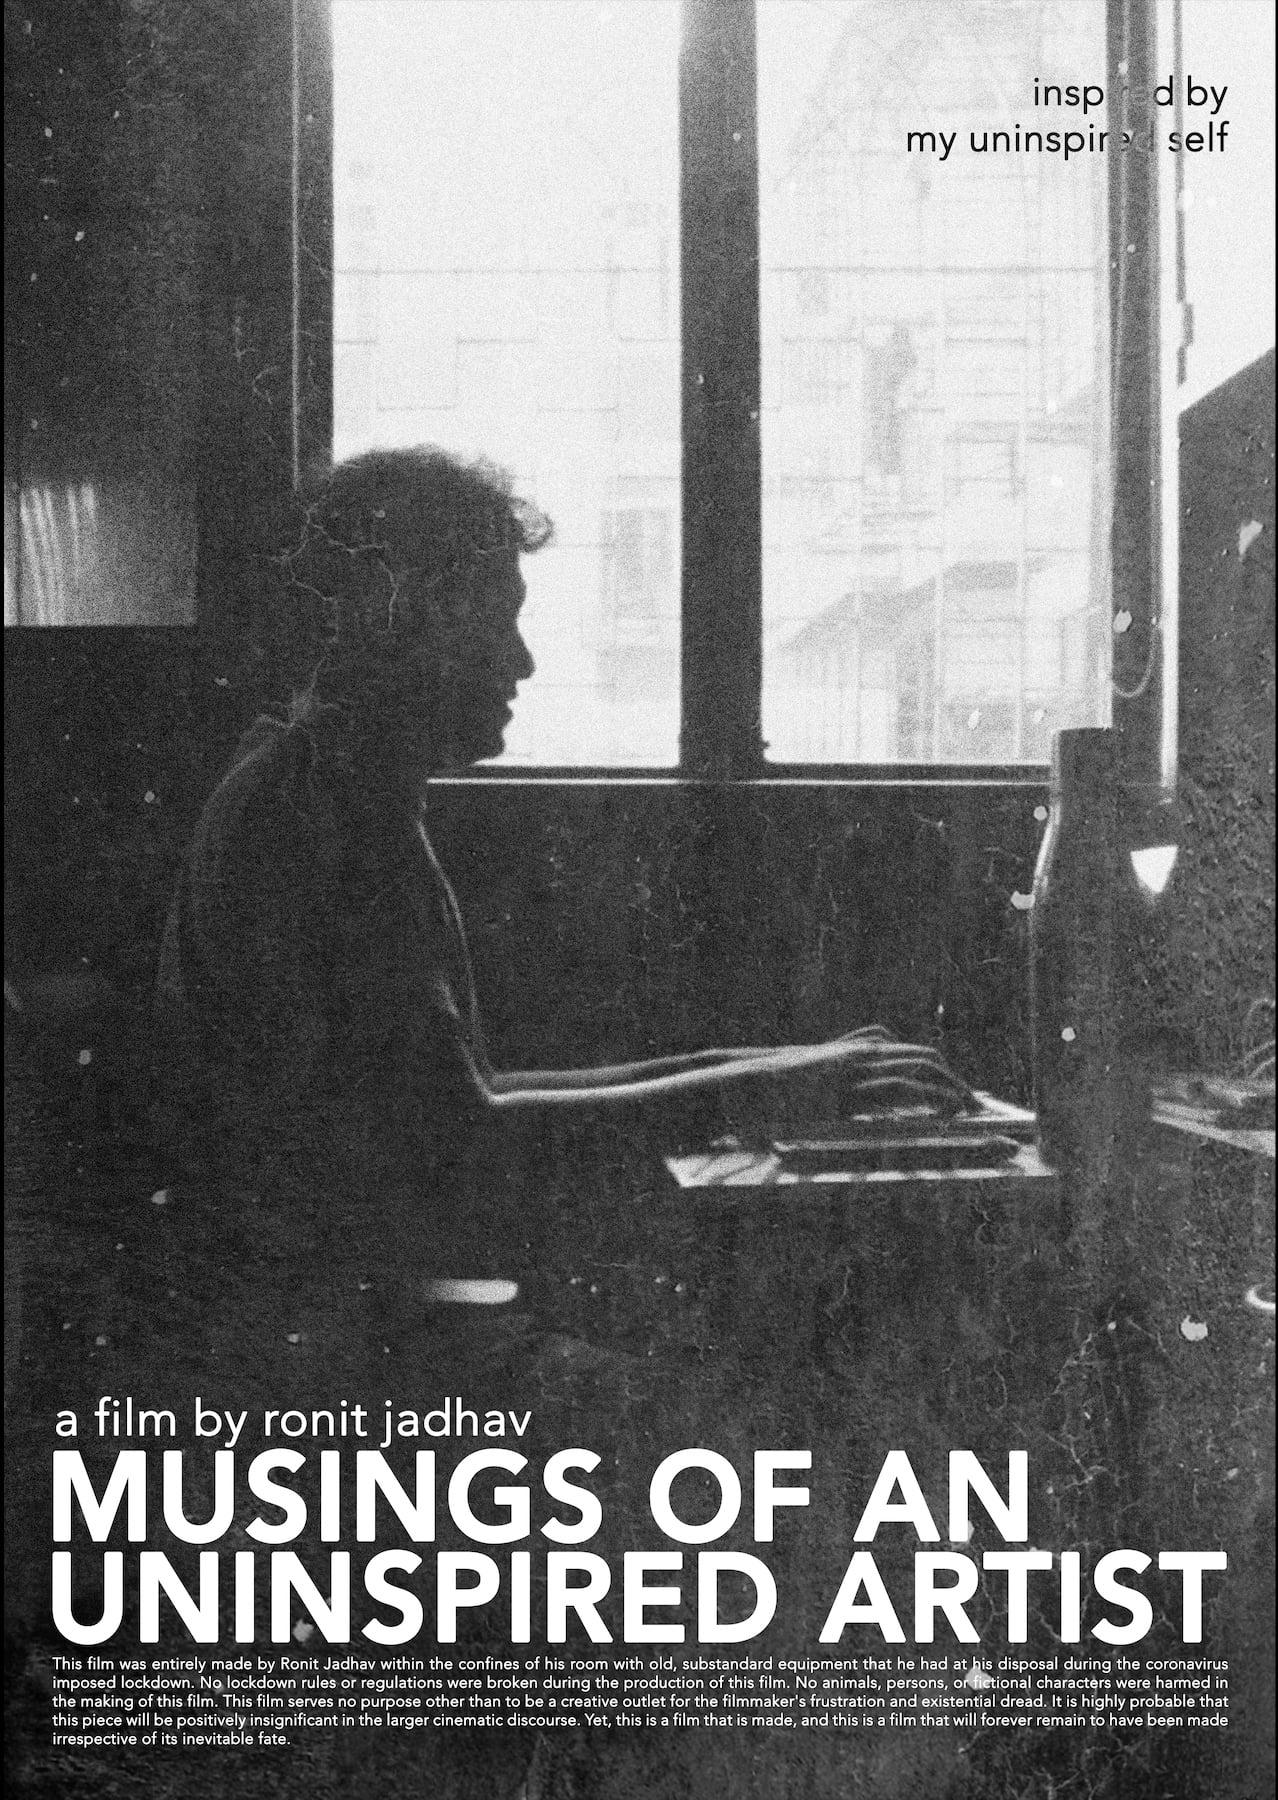 Musings of an Uninspired Artist